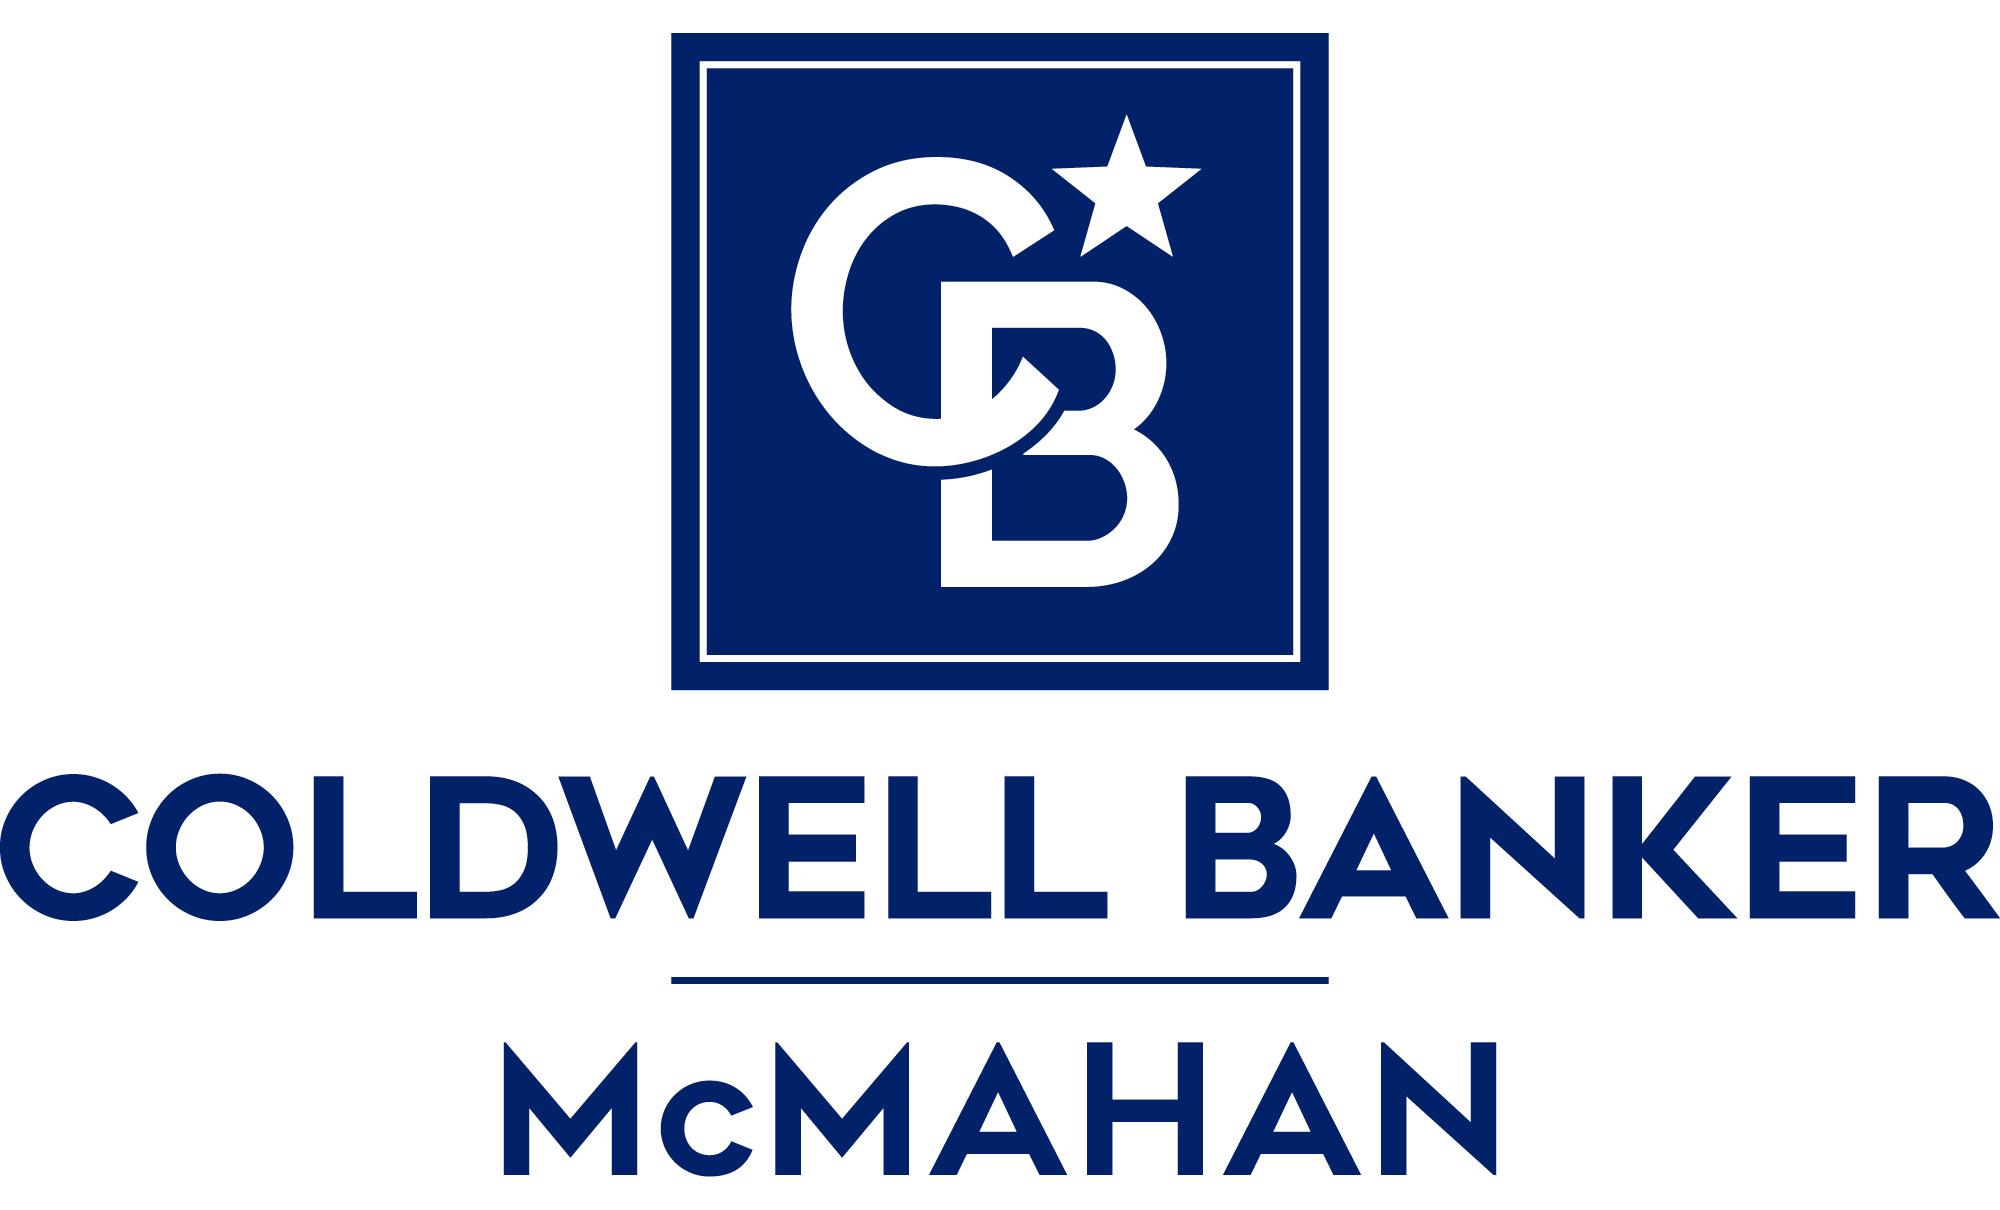 Lesley DePaola - Coldwell Banker McMahan Logo